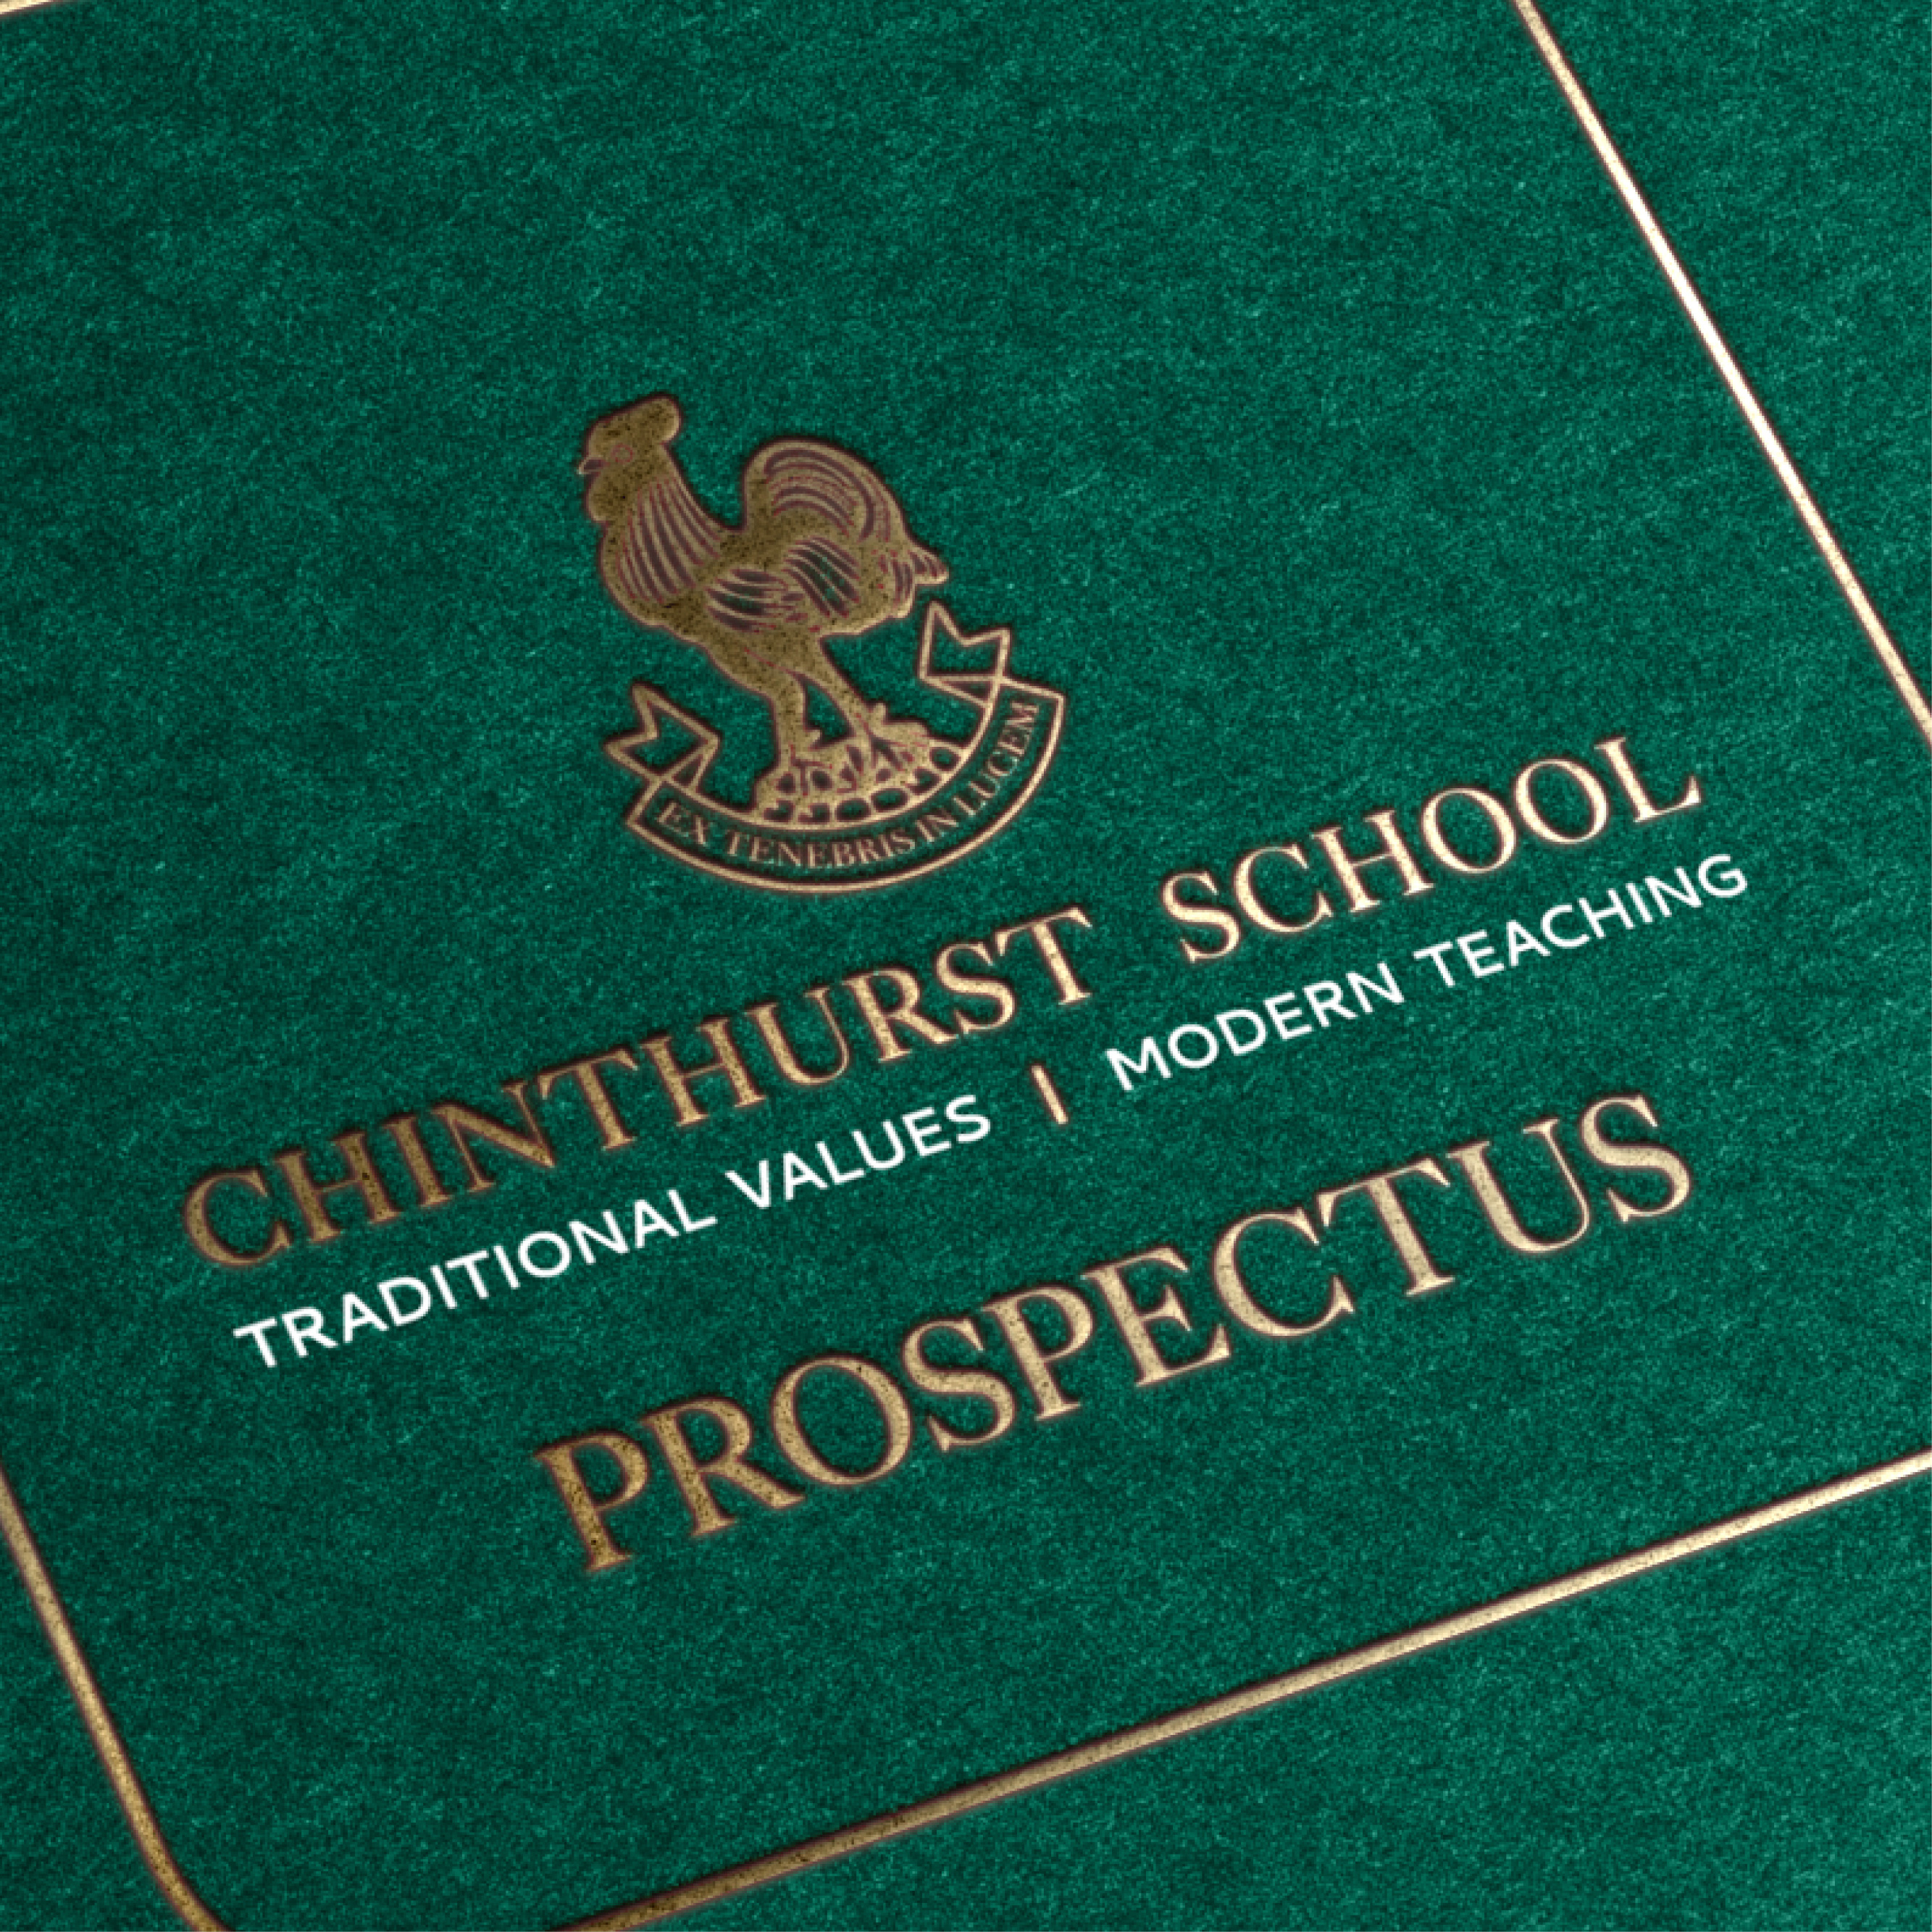 Chinthurst School